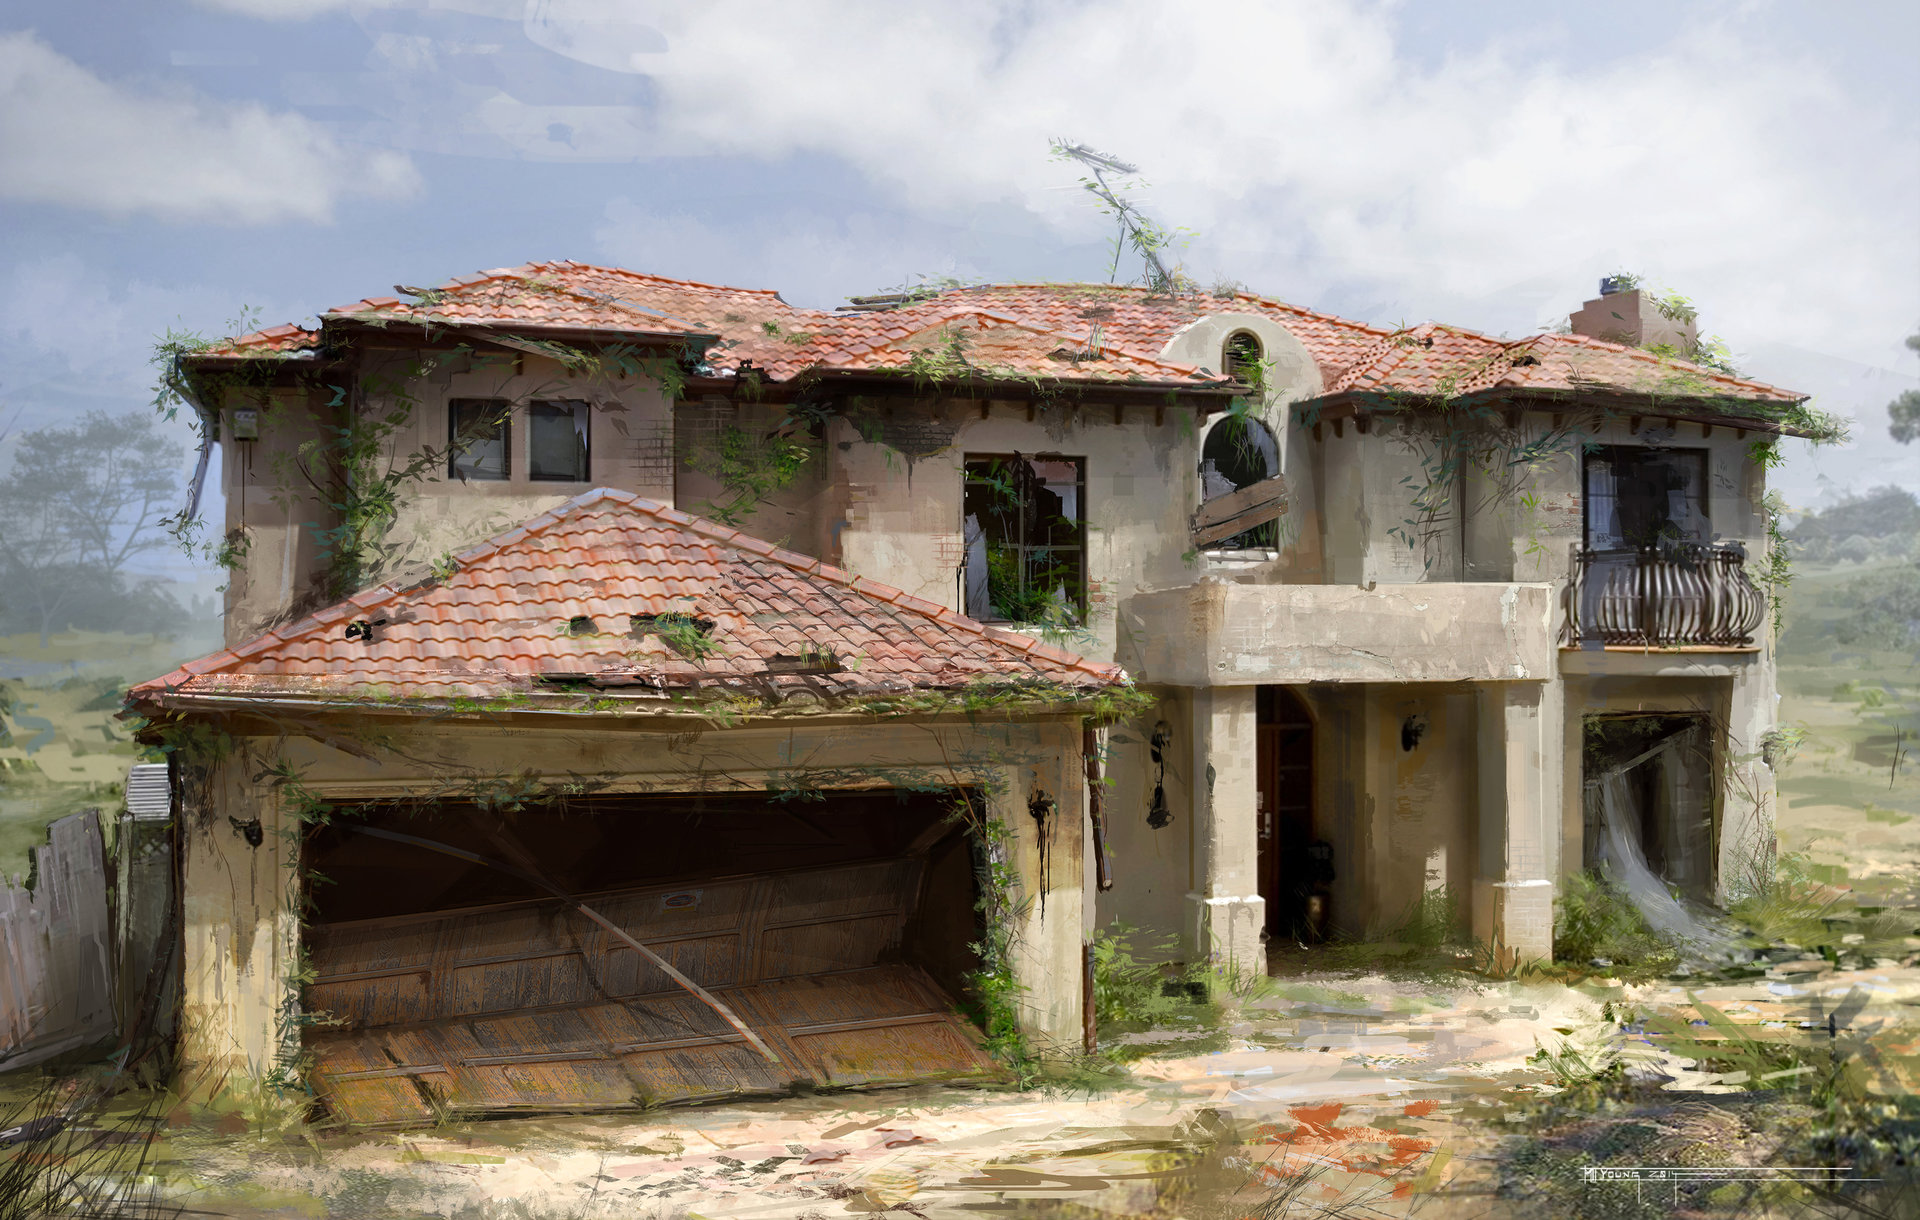 Ruined Home